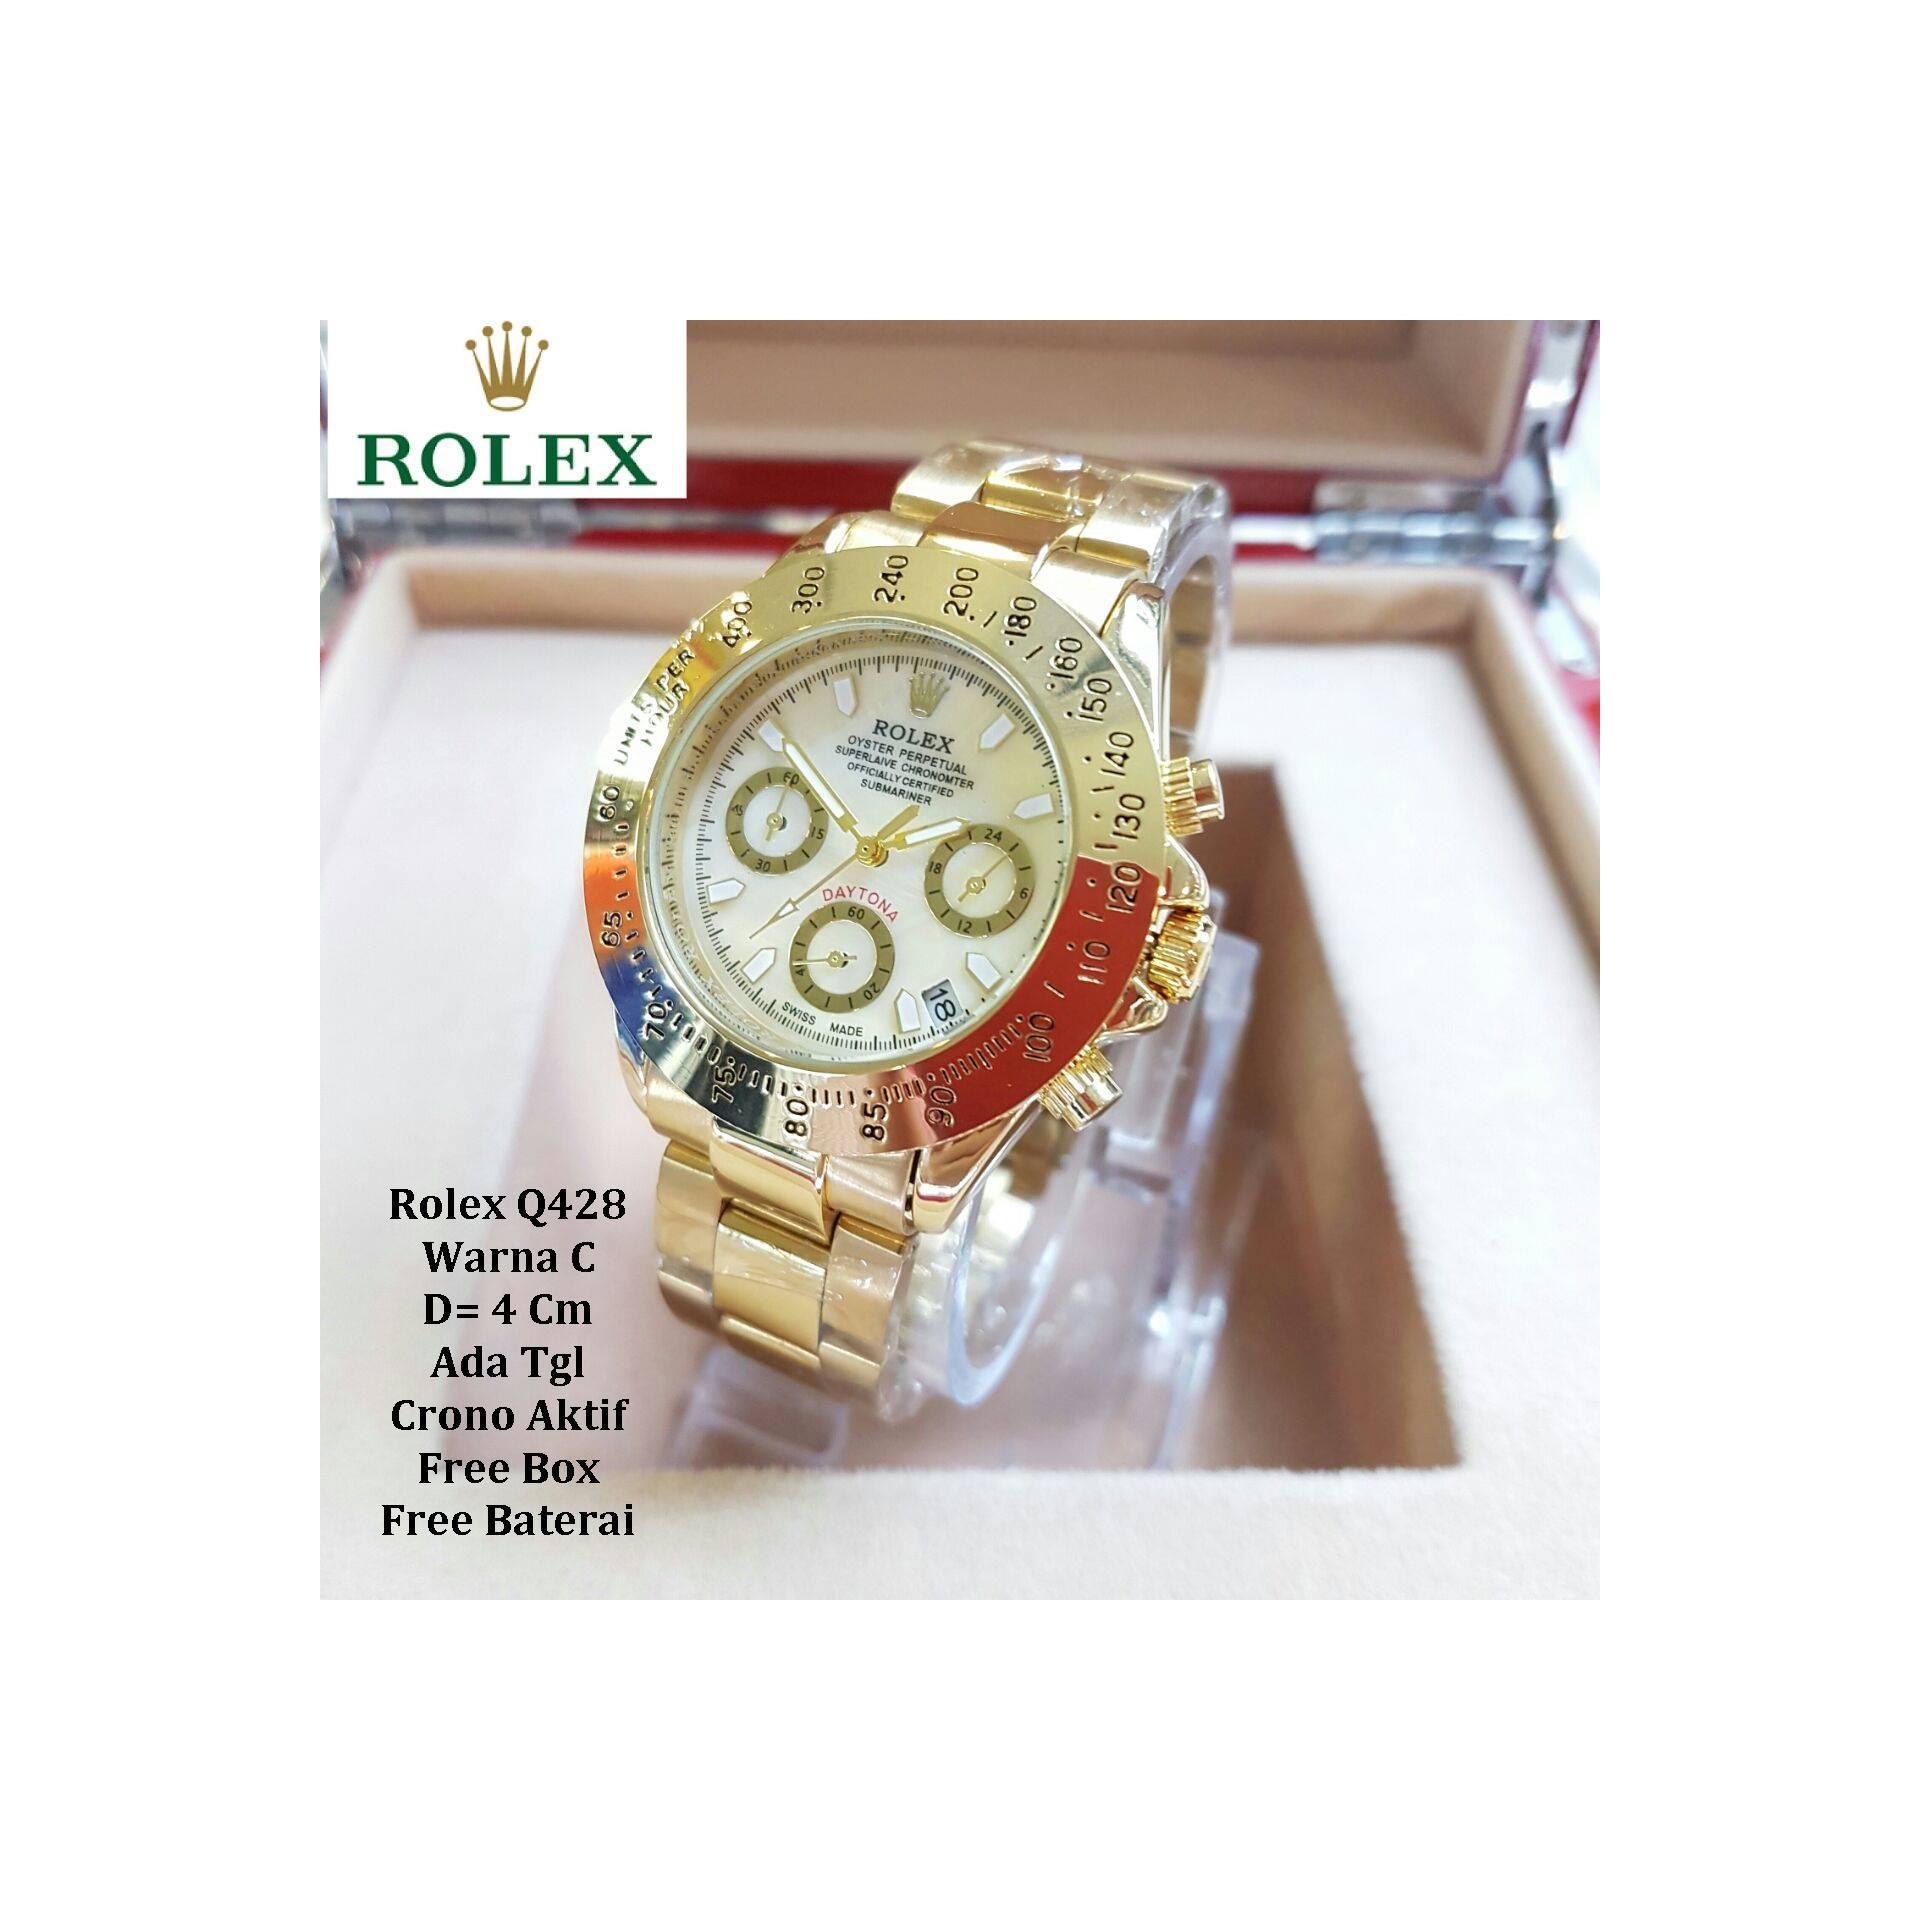 Jam tangan wanita / Jam tangan Murah Rolex Titanium Full Gold + Box